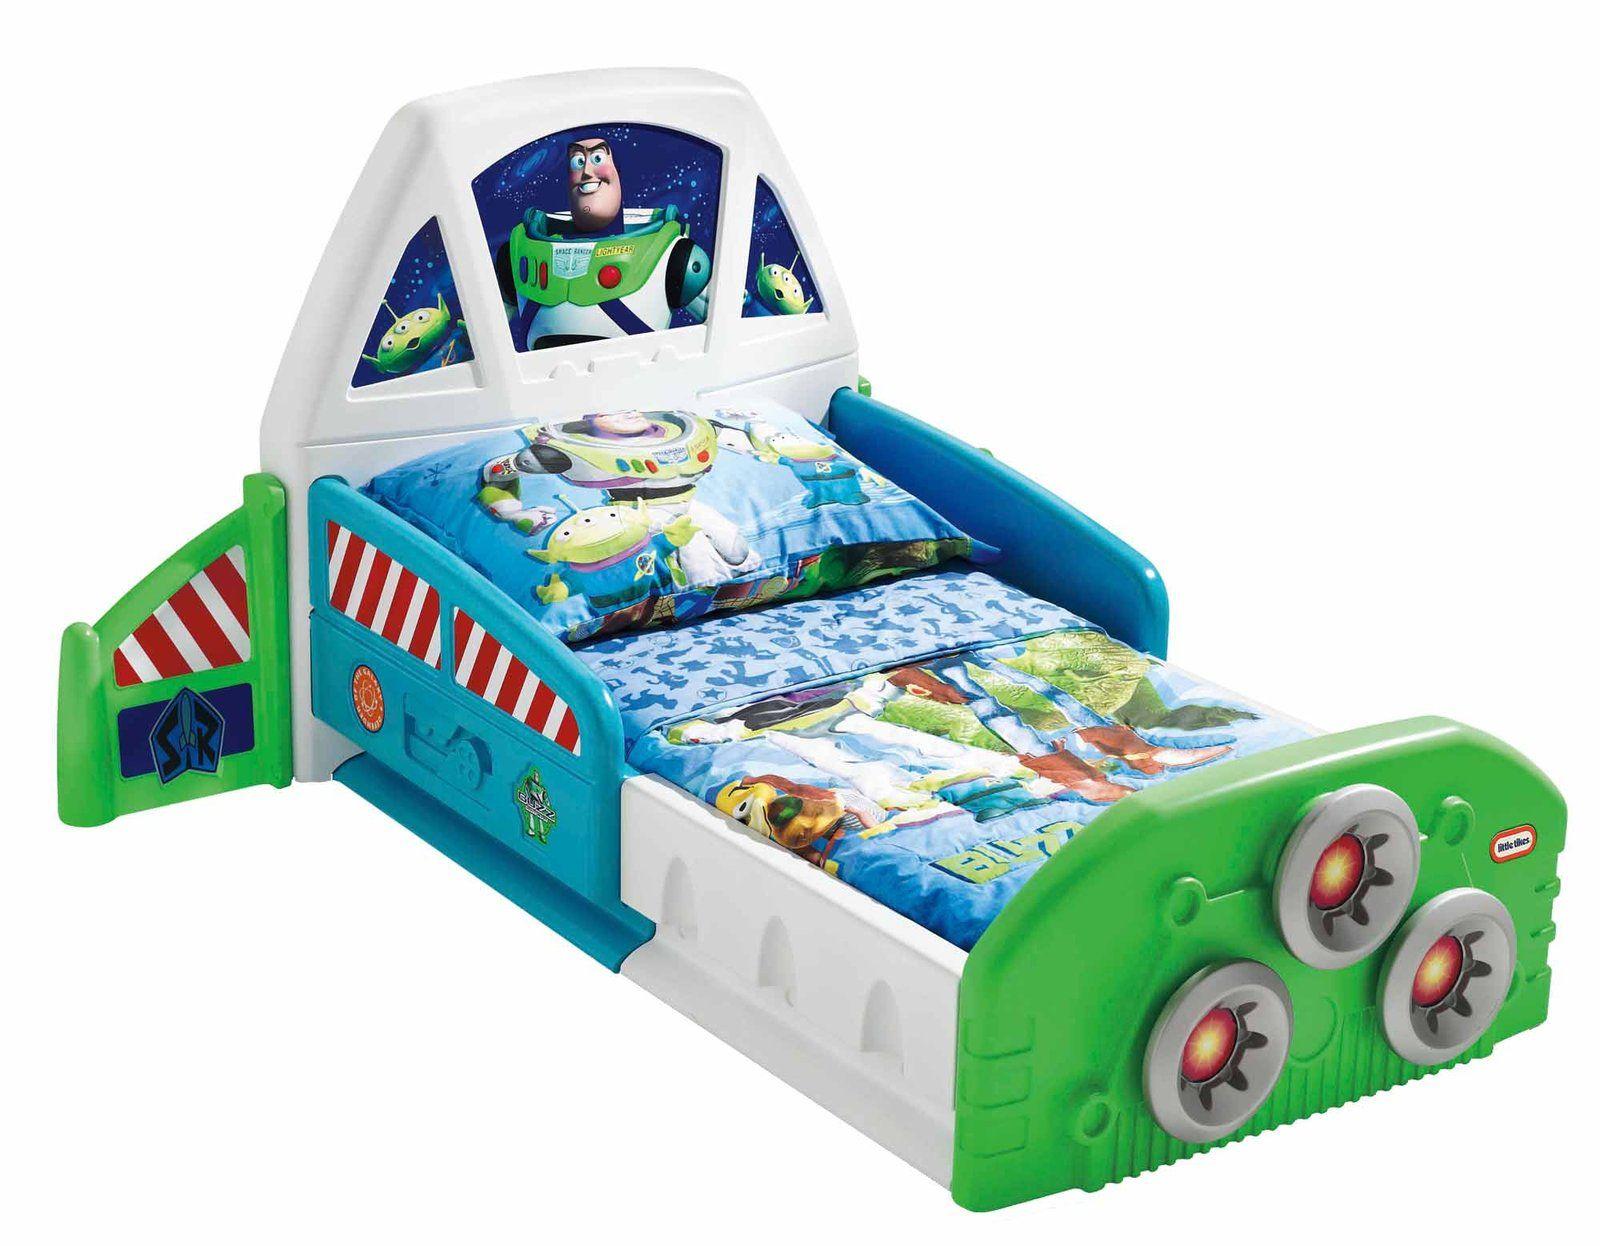 Little Tikes Buzz Lightyear Spaceship Toddler Bed